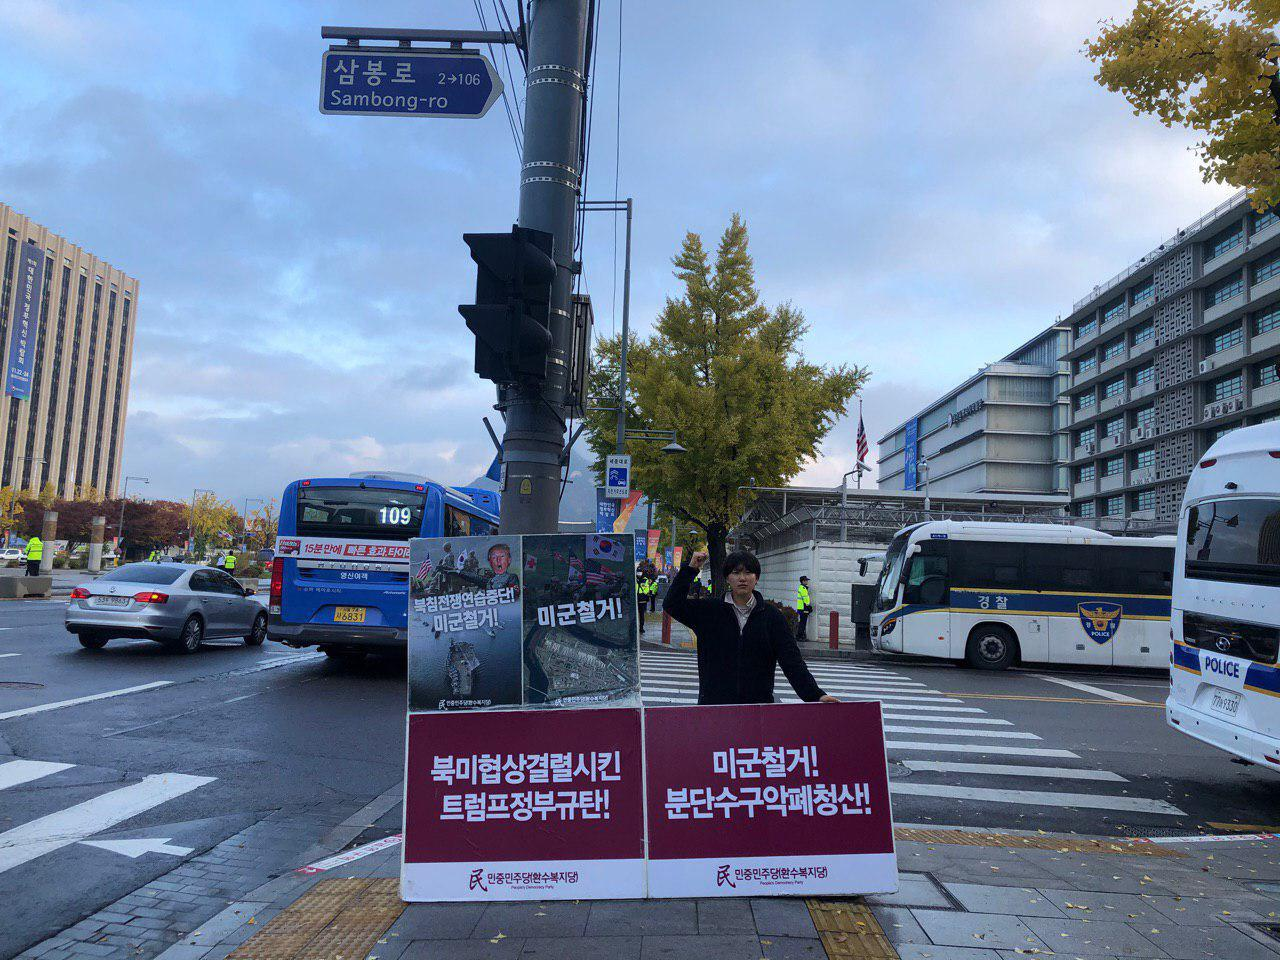 photo_2019-11-11_02-27-12.jpg